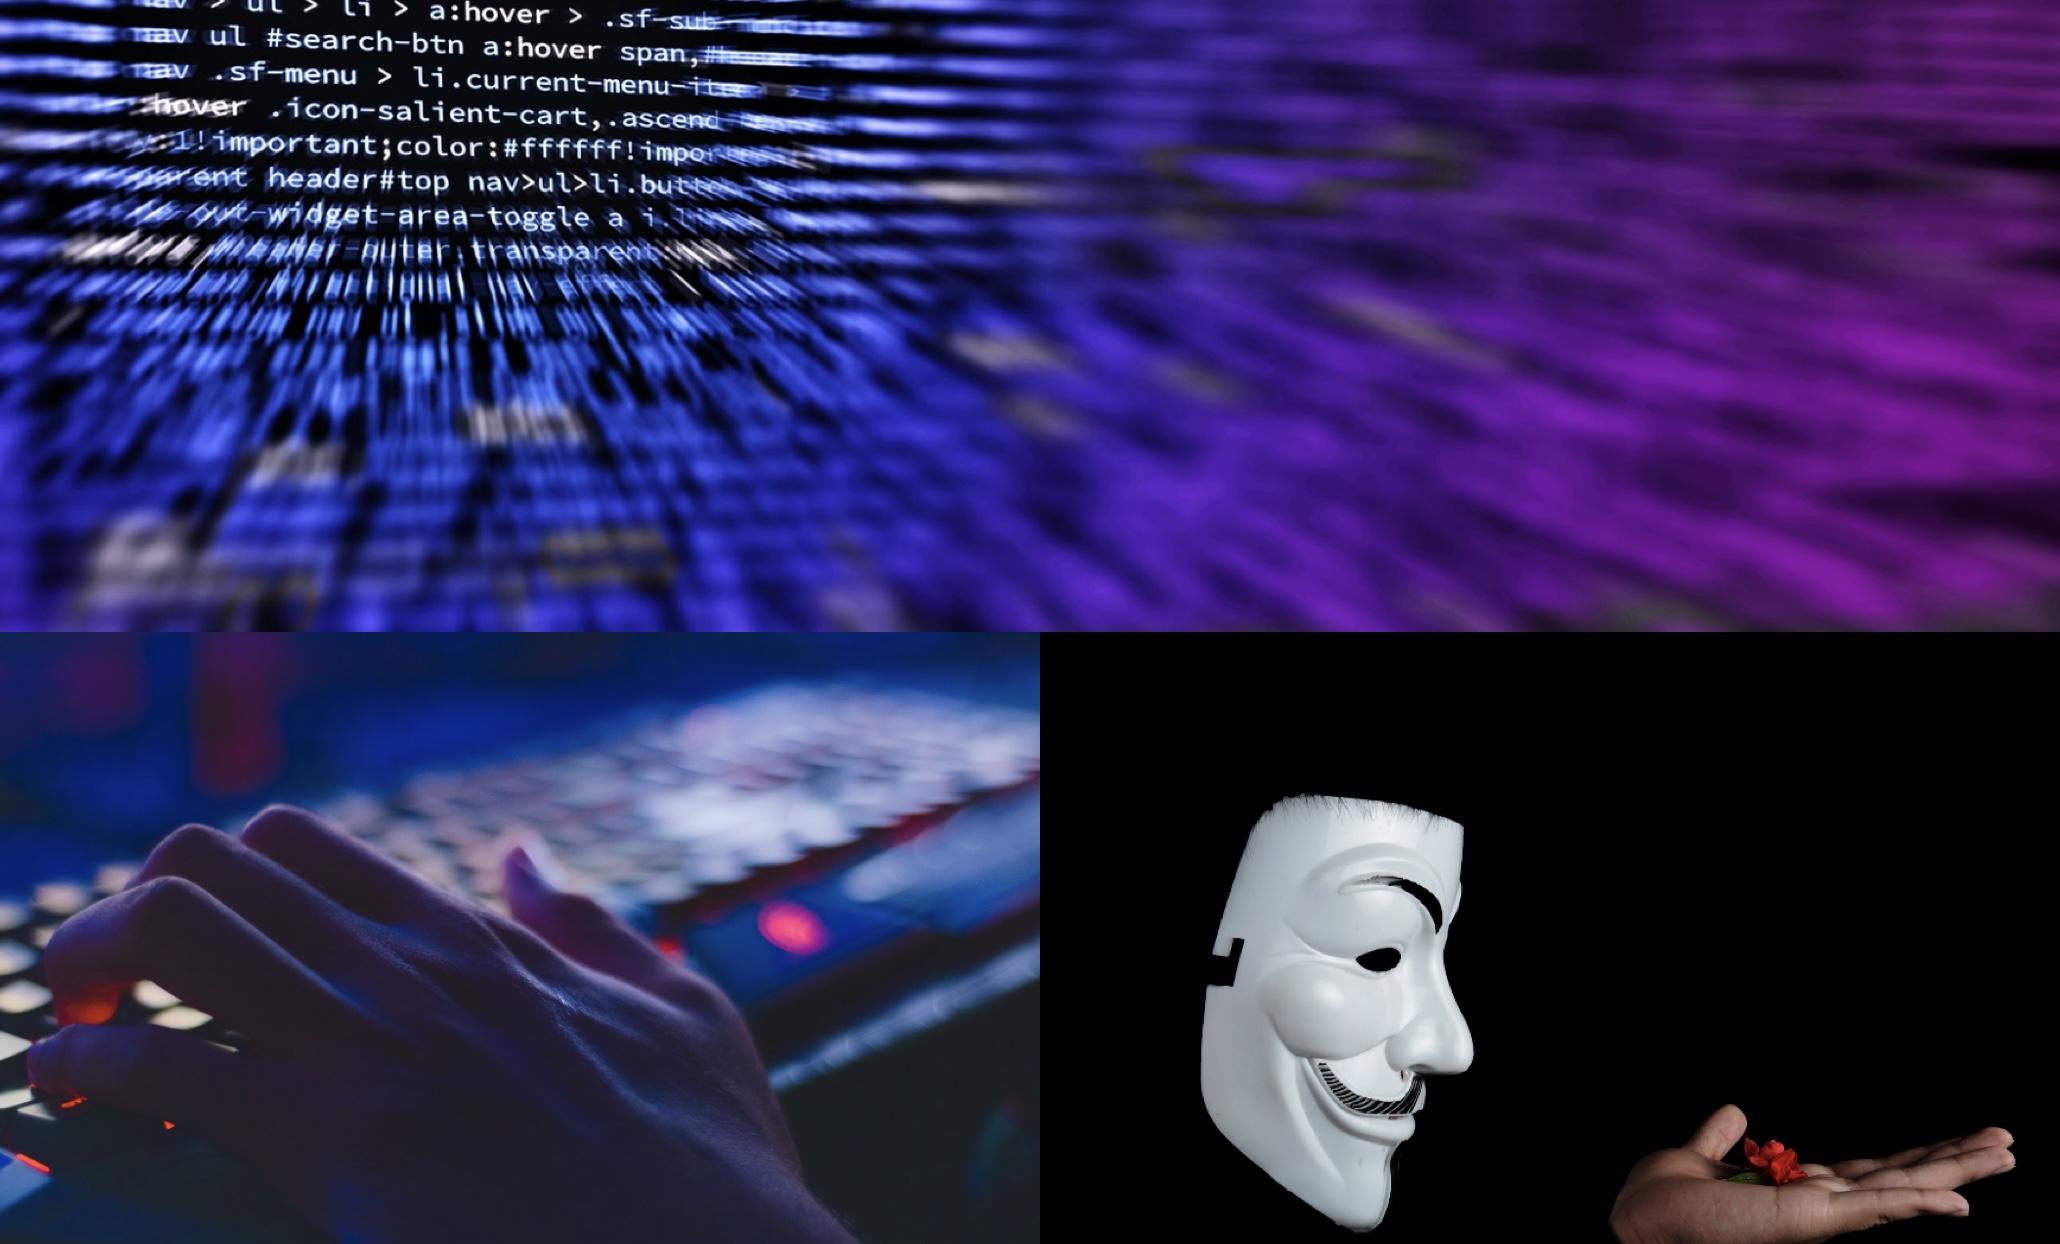 hacker-titulka